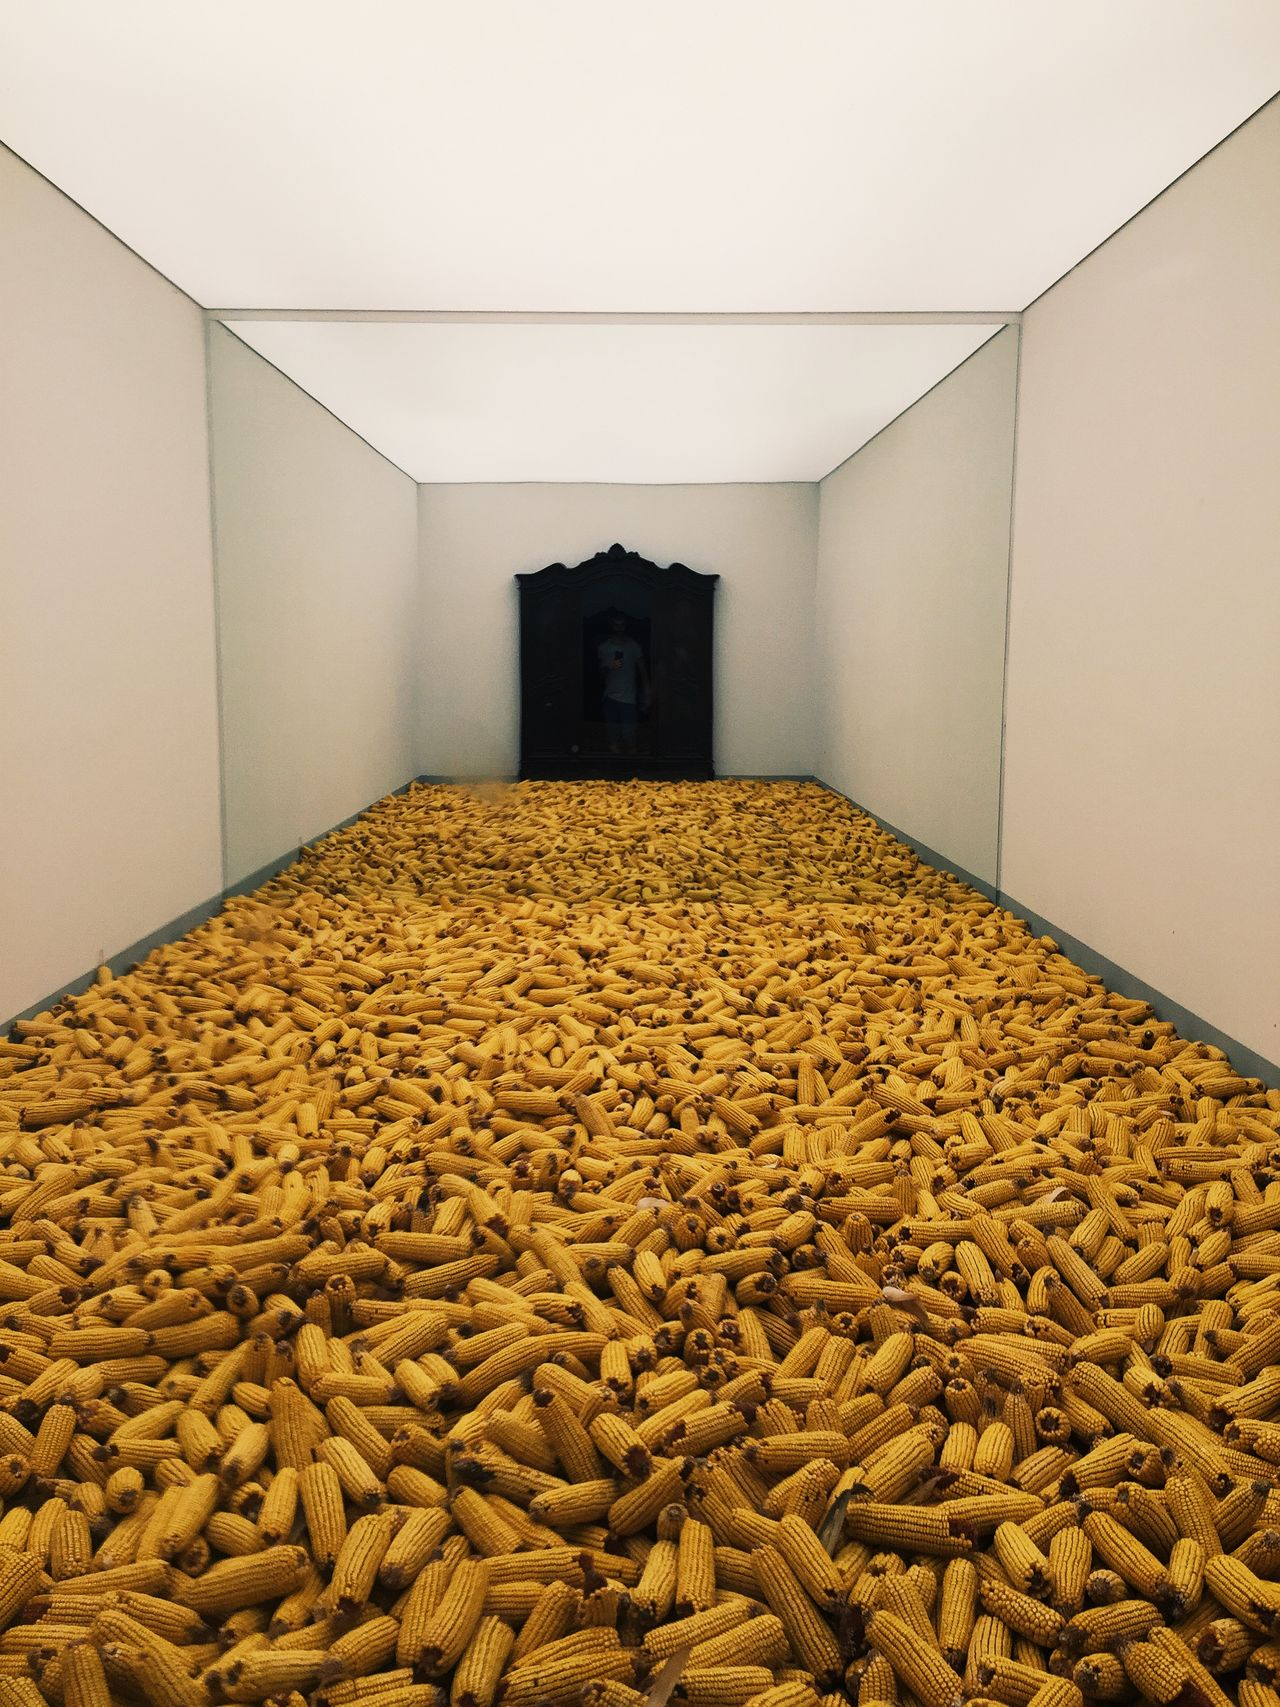 Exhibition Venicebiennale2015 Art Taking Photos Corn Selfie ✌ La Biennale Di Venezia Mirrorselfie Minimalism From Vienna To Milan